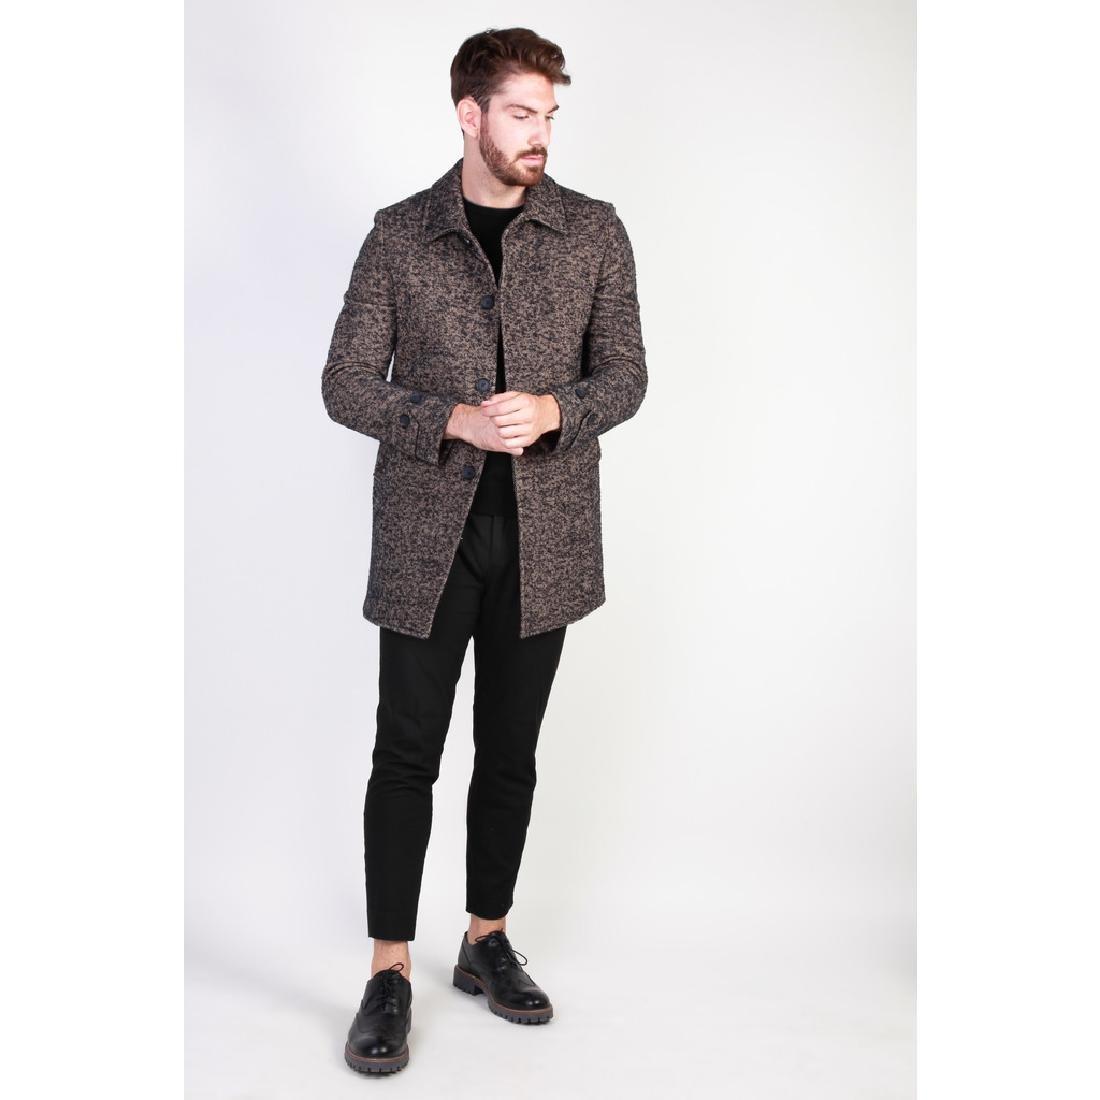 New Men's Italian Wool Blend Coat US 38 - 3